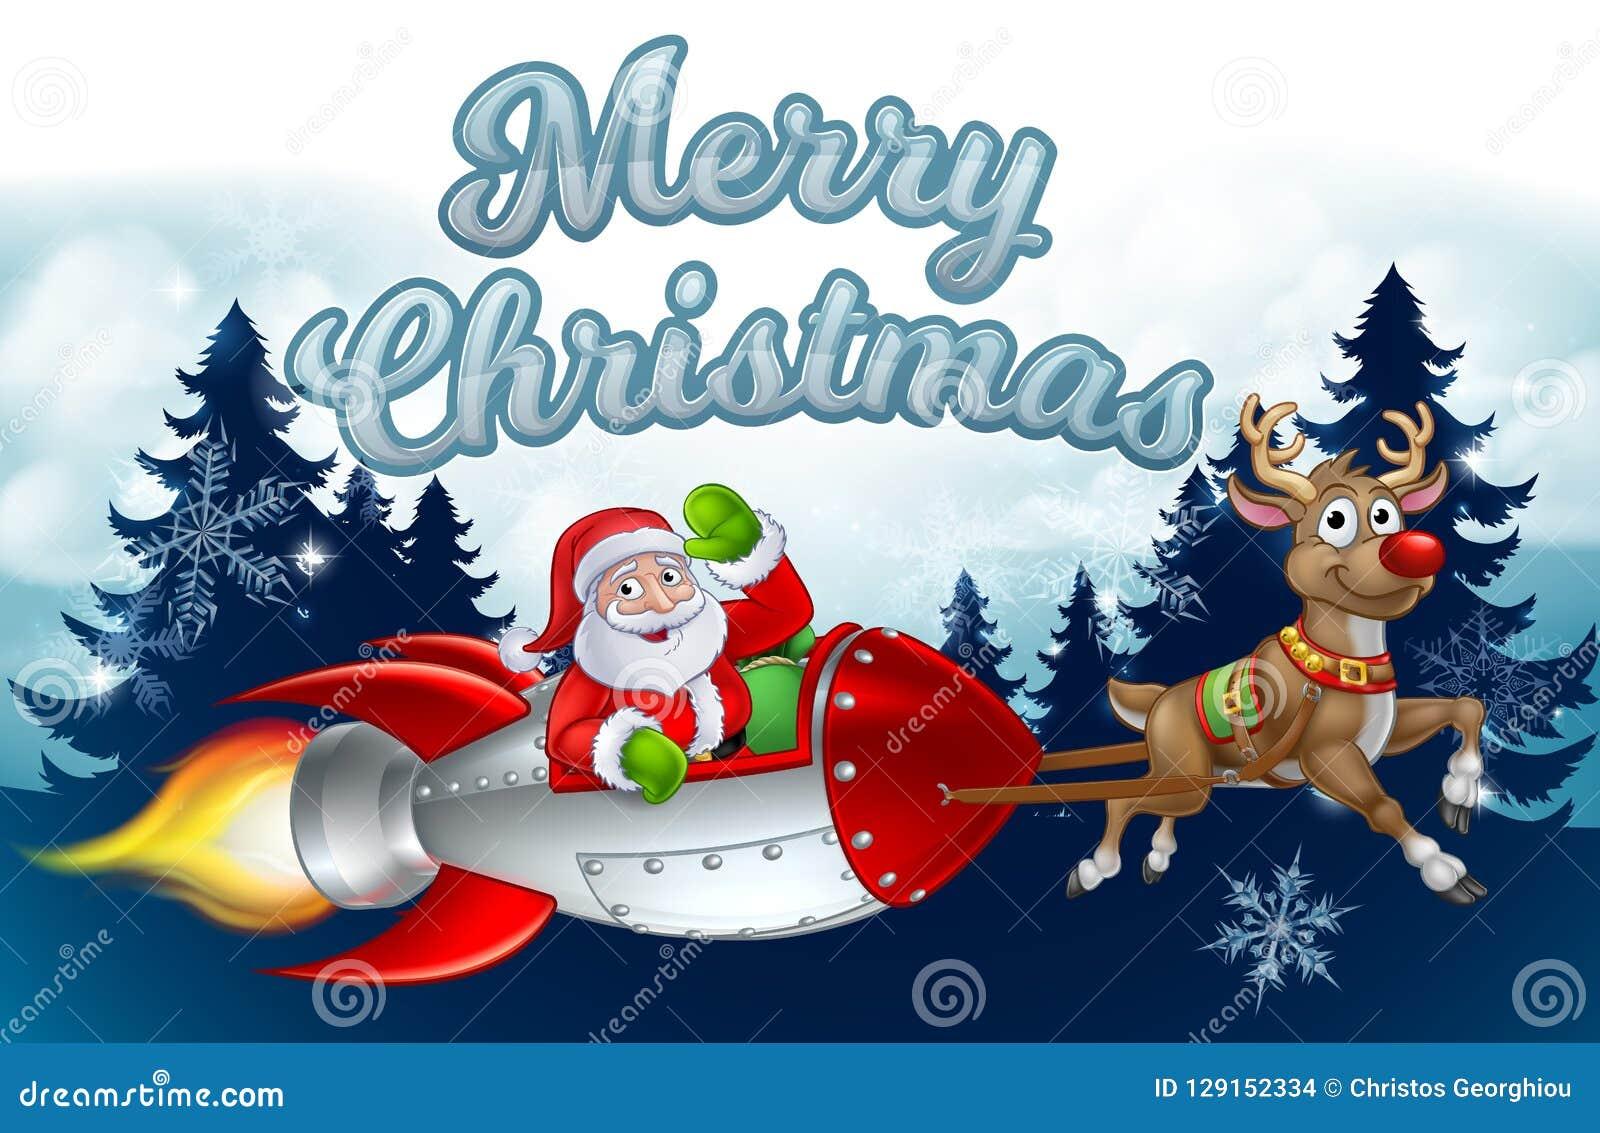 Santa Rocket Sleigh Merry Christmas Background